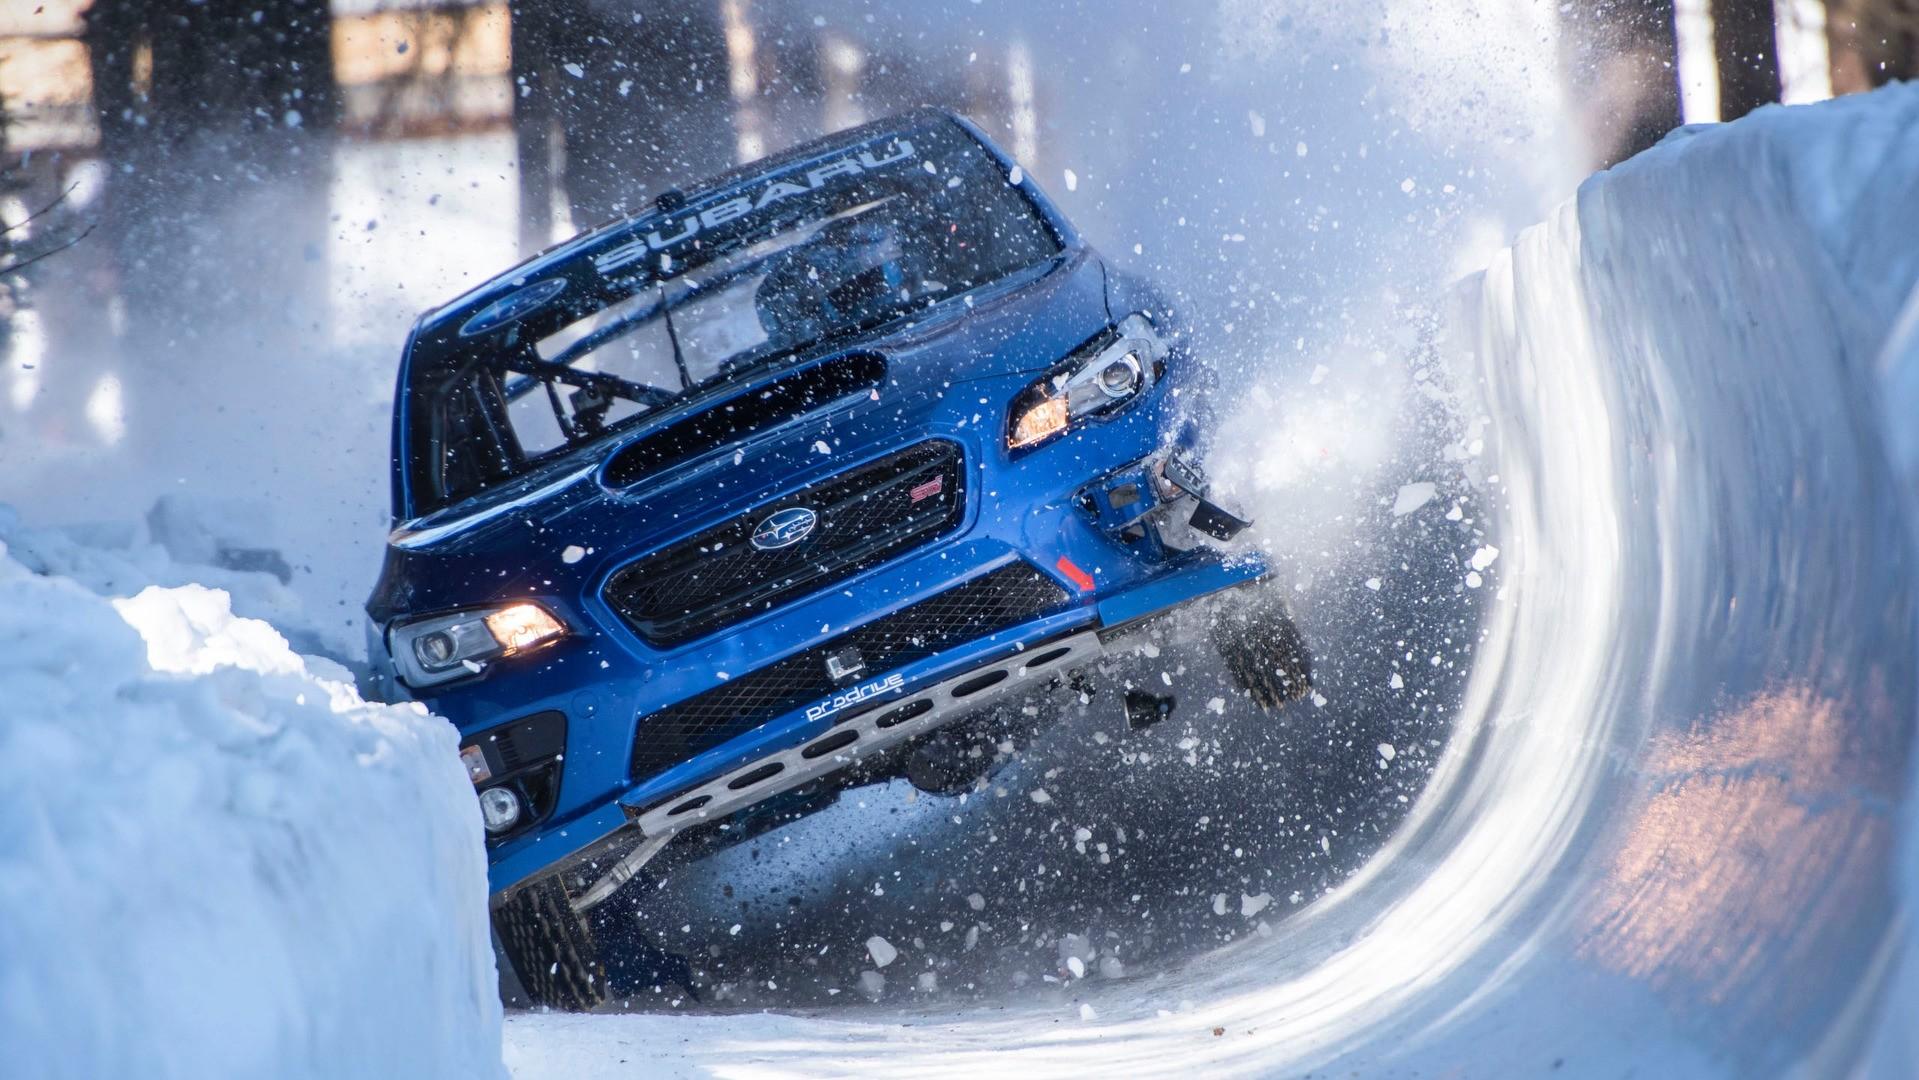 Motor For Electric Car >> 2018 Subaru Impreza WRX STI Rendered as a Hatchback - autoevolution